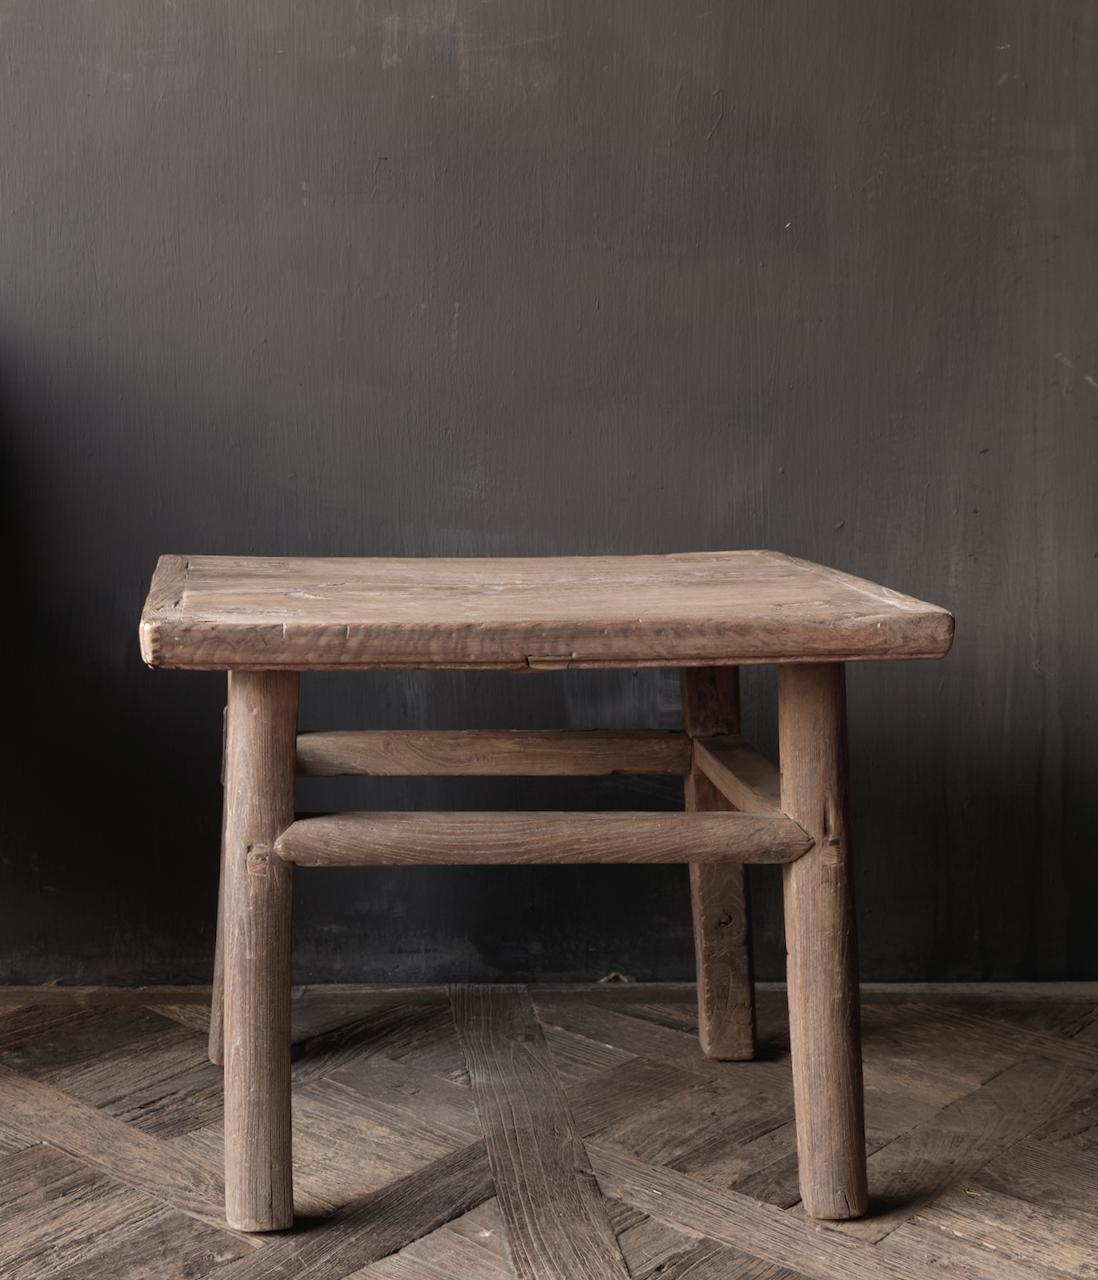 Oud Authentiek houten Salon/bijzet Tafeltje vierkant Uniek item-4